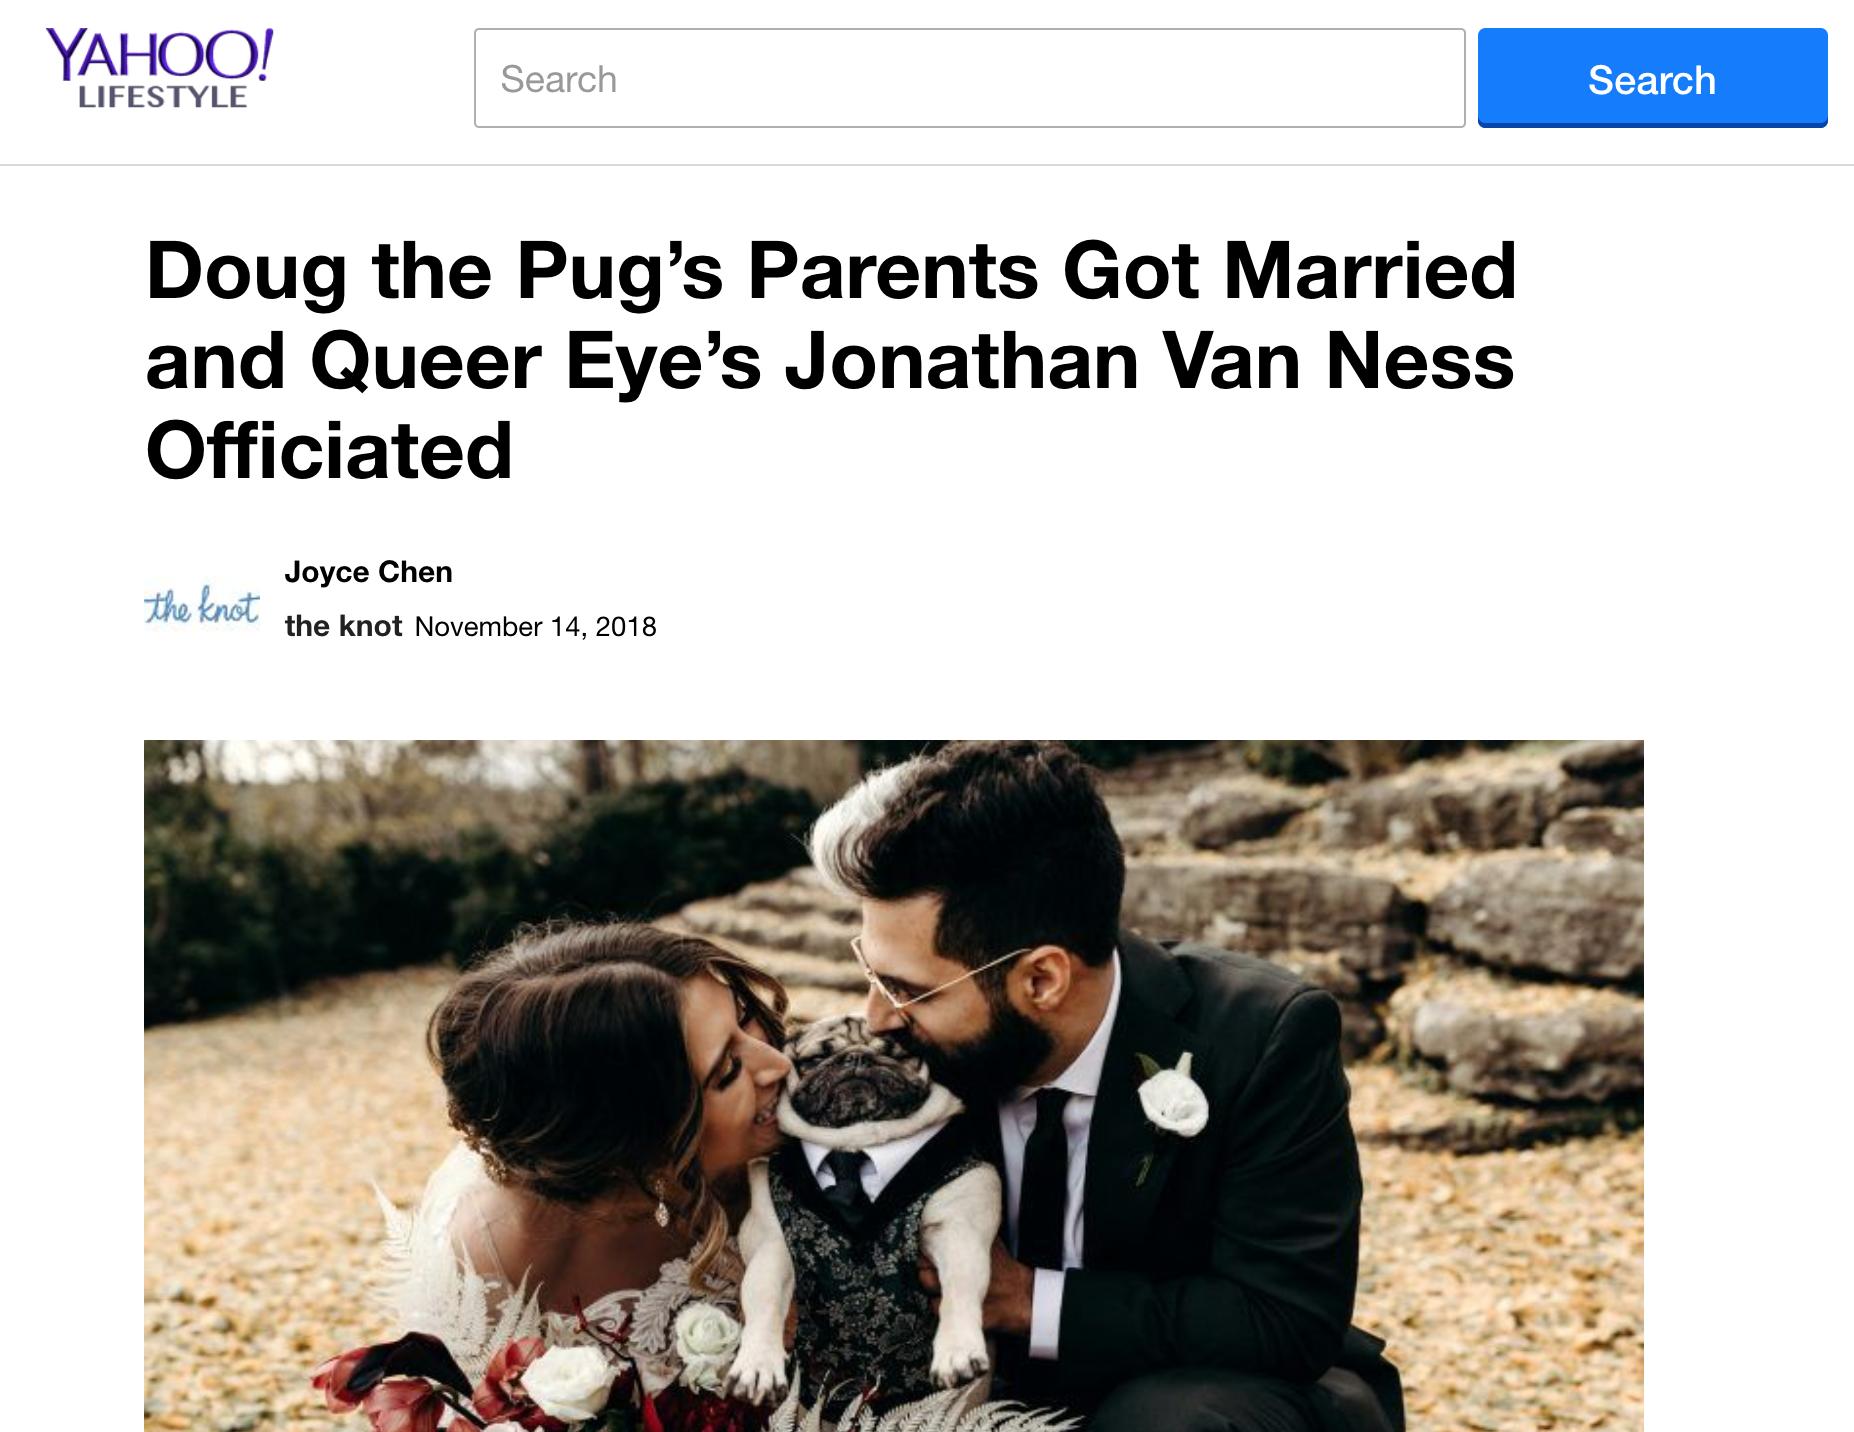 Yahoo! - Leslie + Rob + It's Doug the Pug